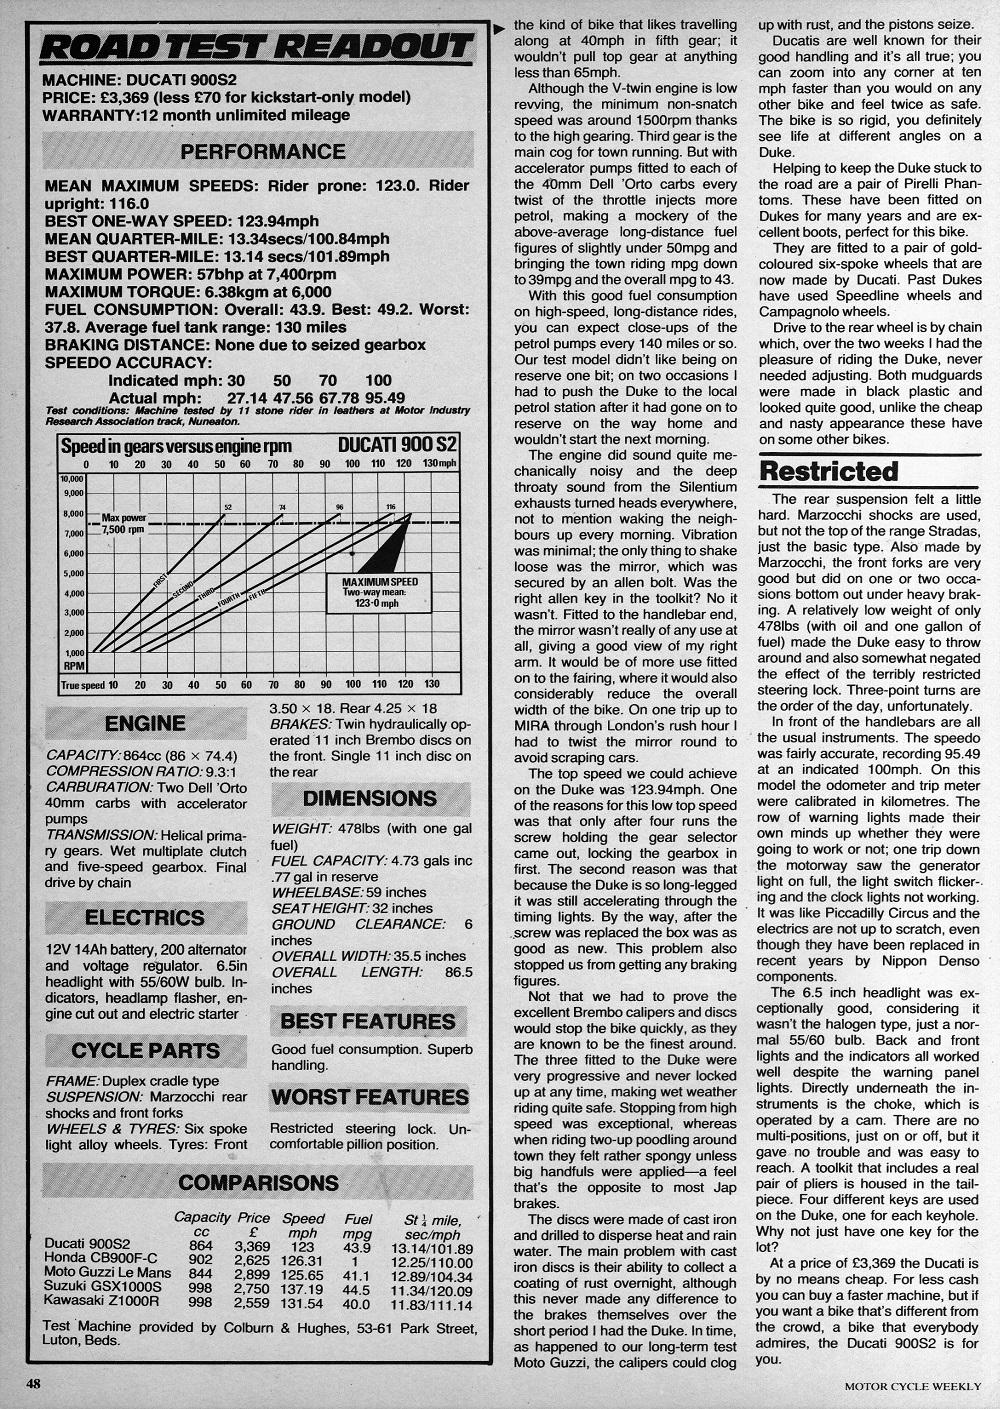 1983 Ducati 900S2 road test.3.jpg